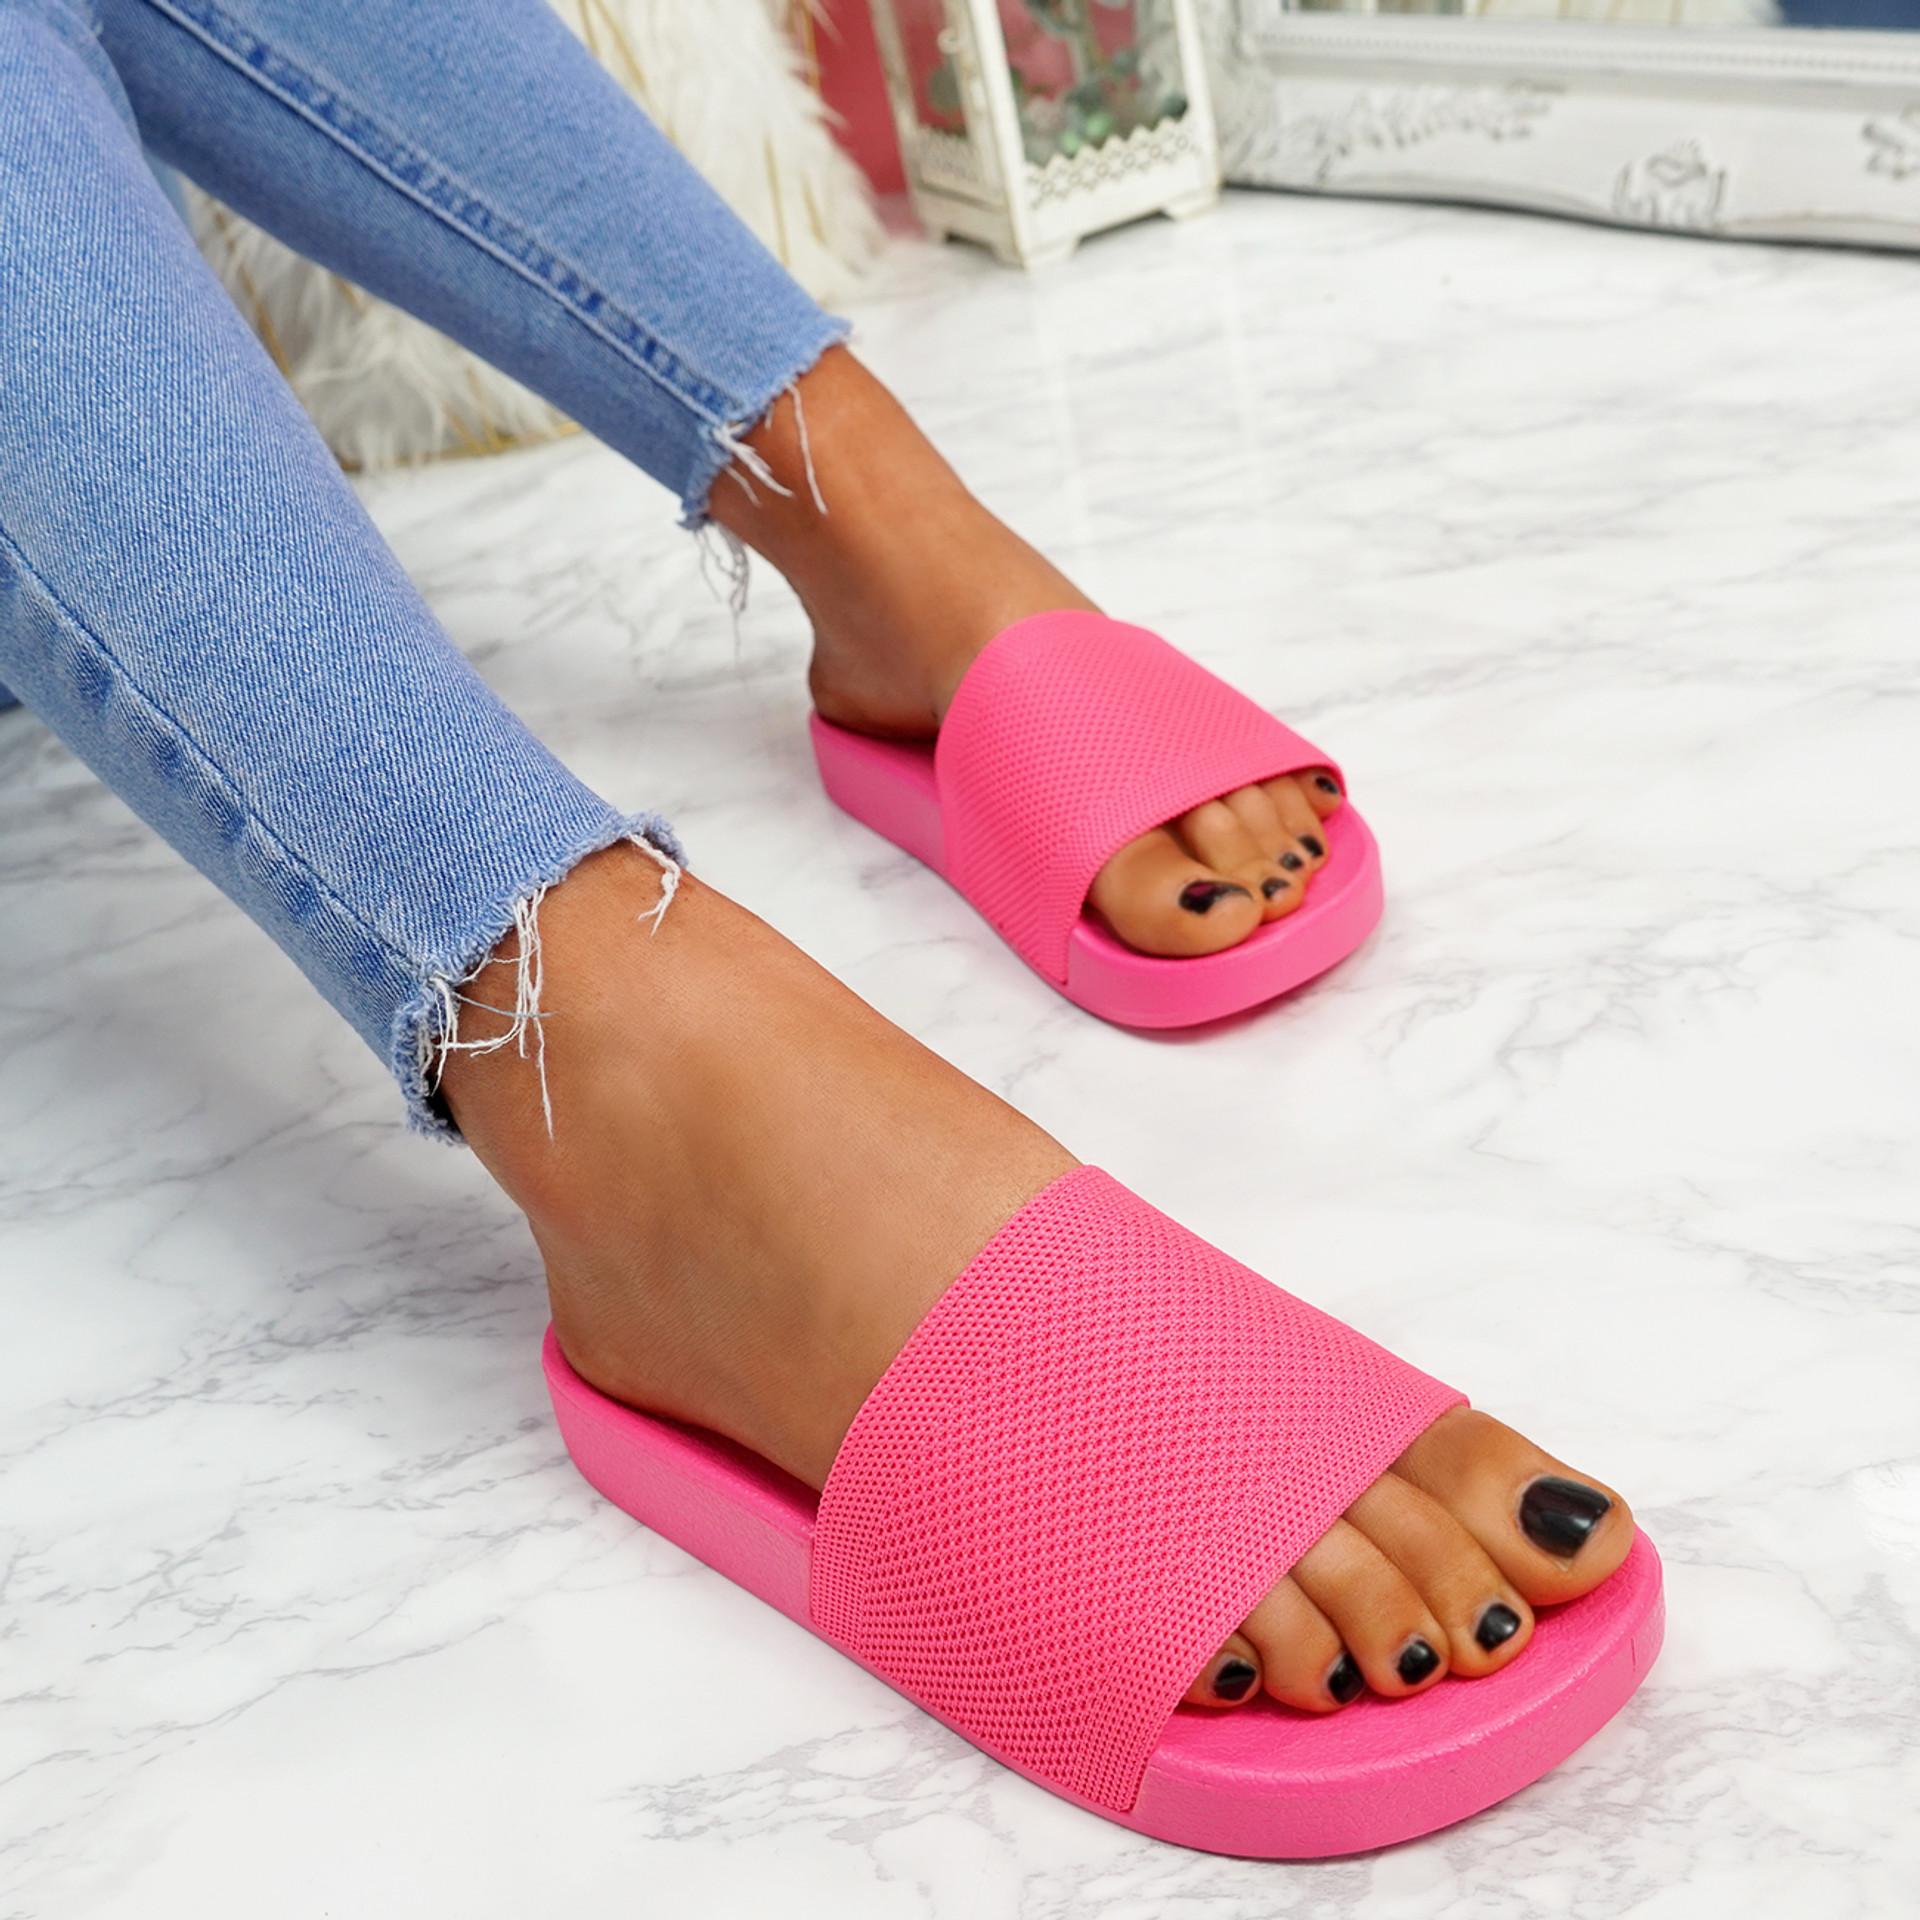 Mannya Fluorescent Fuchsia Slip On Sandals